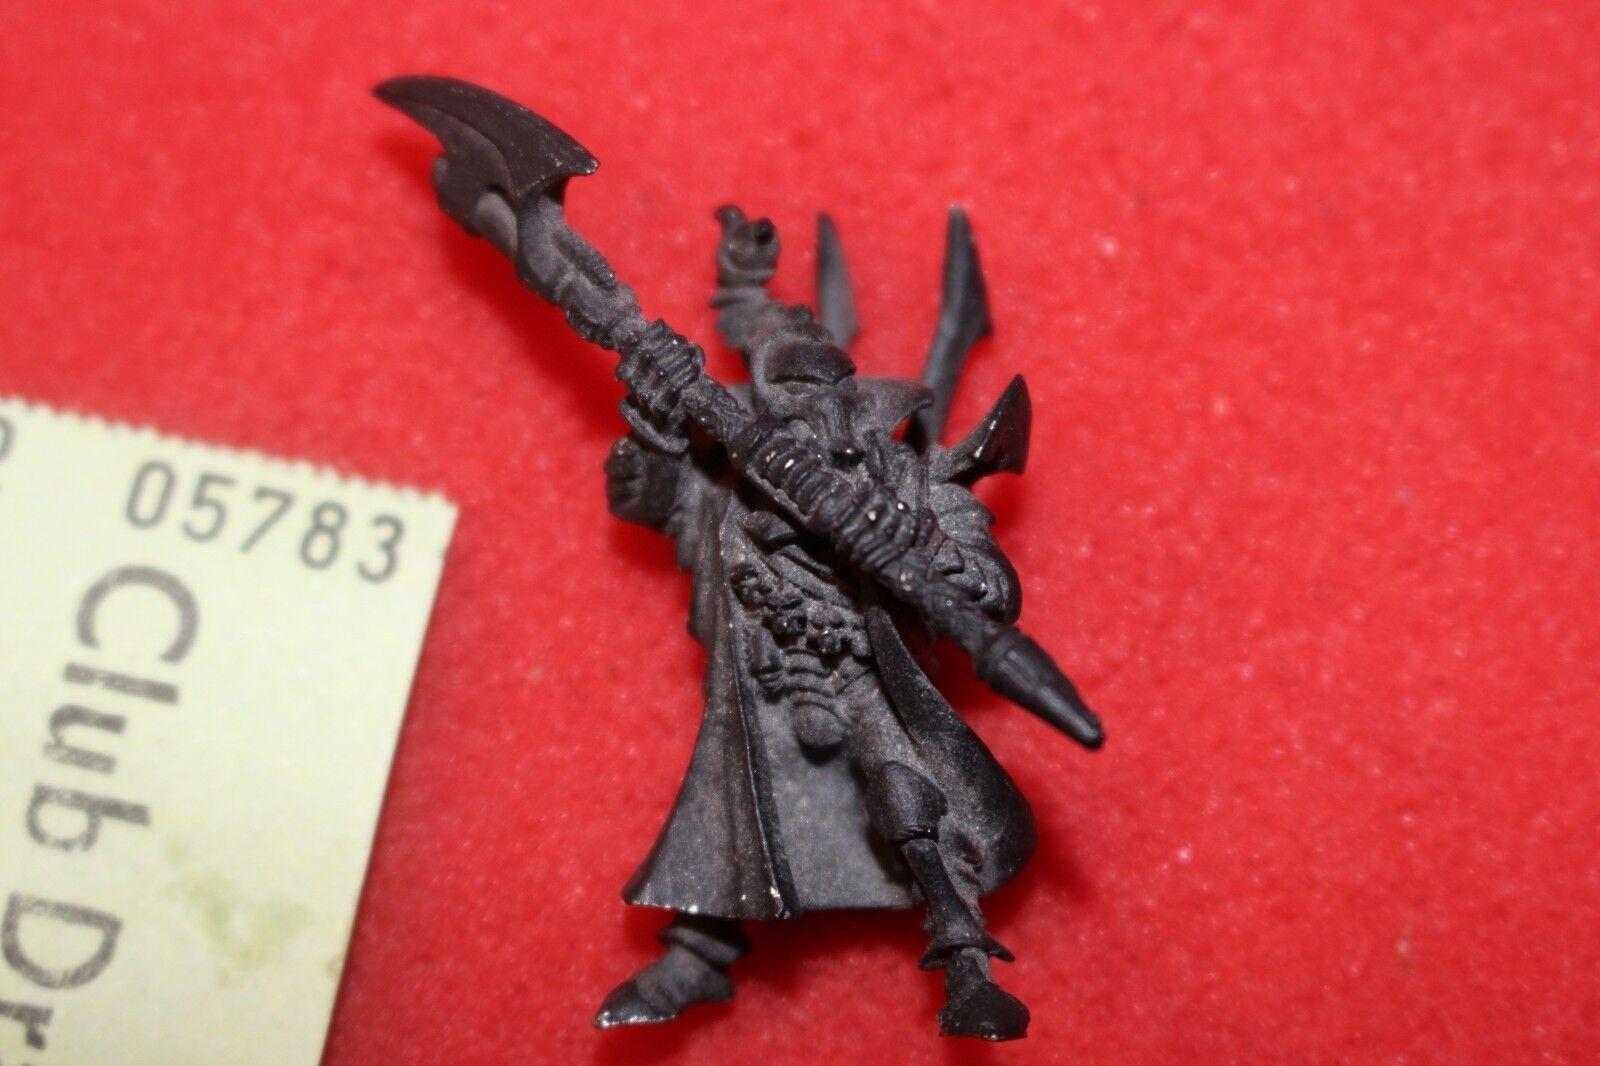 Games Workshop Warhammer 40k Dark Eldar Drukhari Asdrubael Vect Incubi OOP Metal